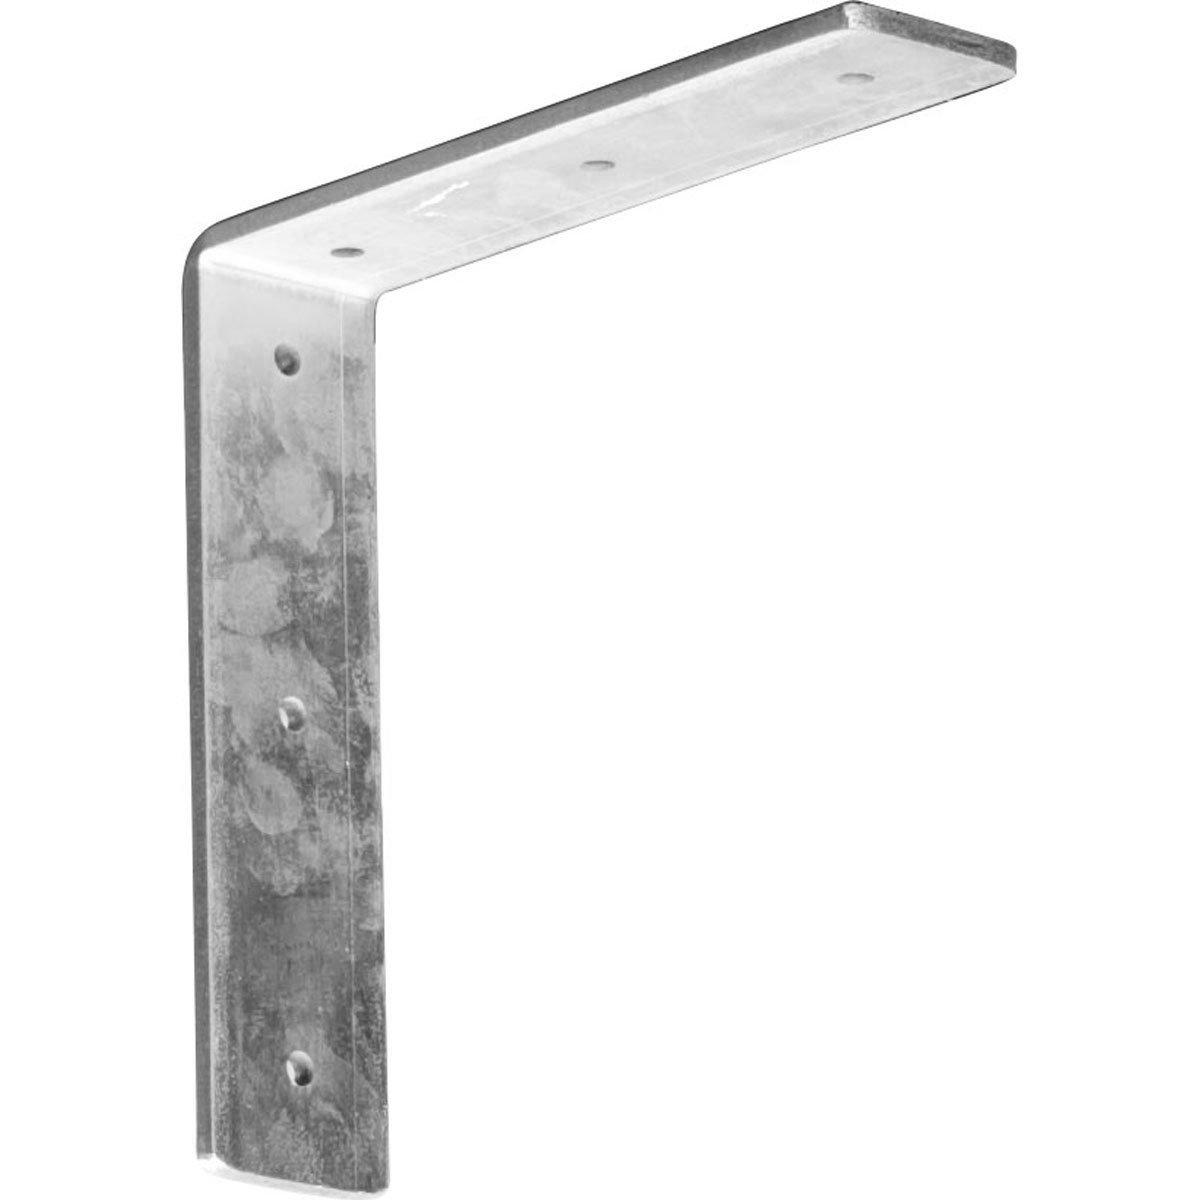 Ekena Millwork BKTM02X08X08HACRS-CASE-4 2 inch W x 8 inch D x 8 inch H Hamilton Bracket, Steel (4-Pack),